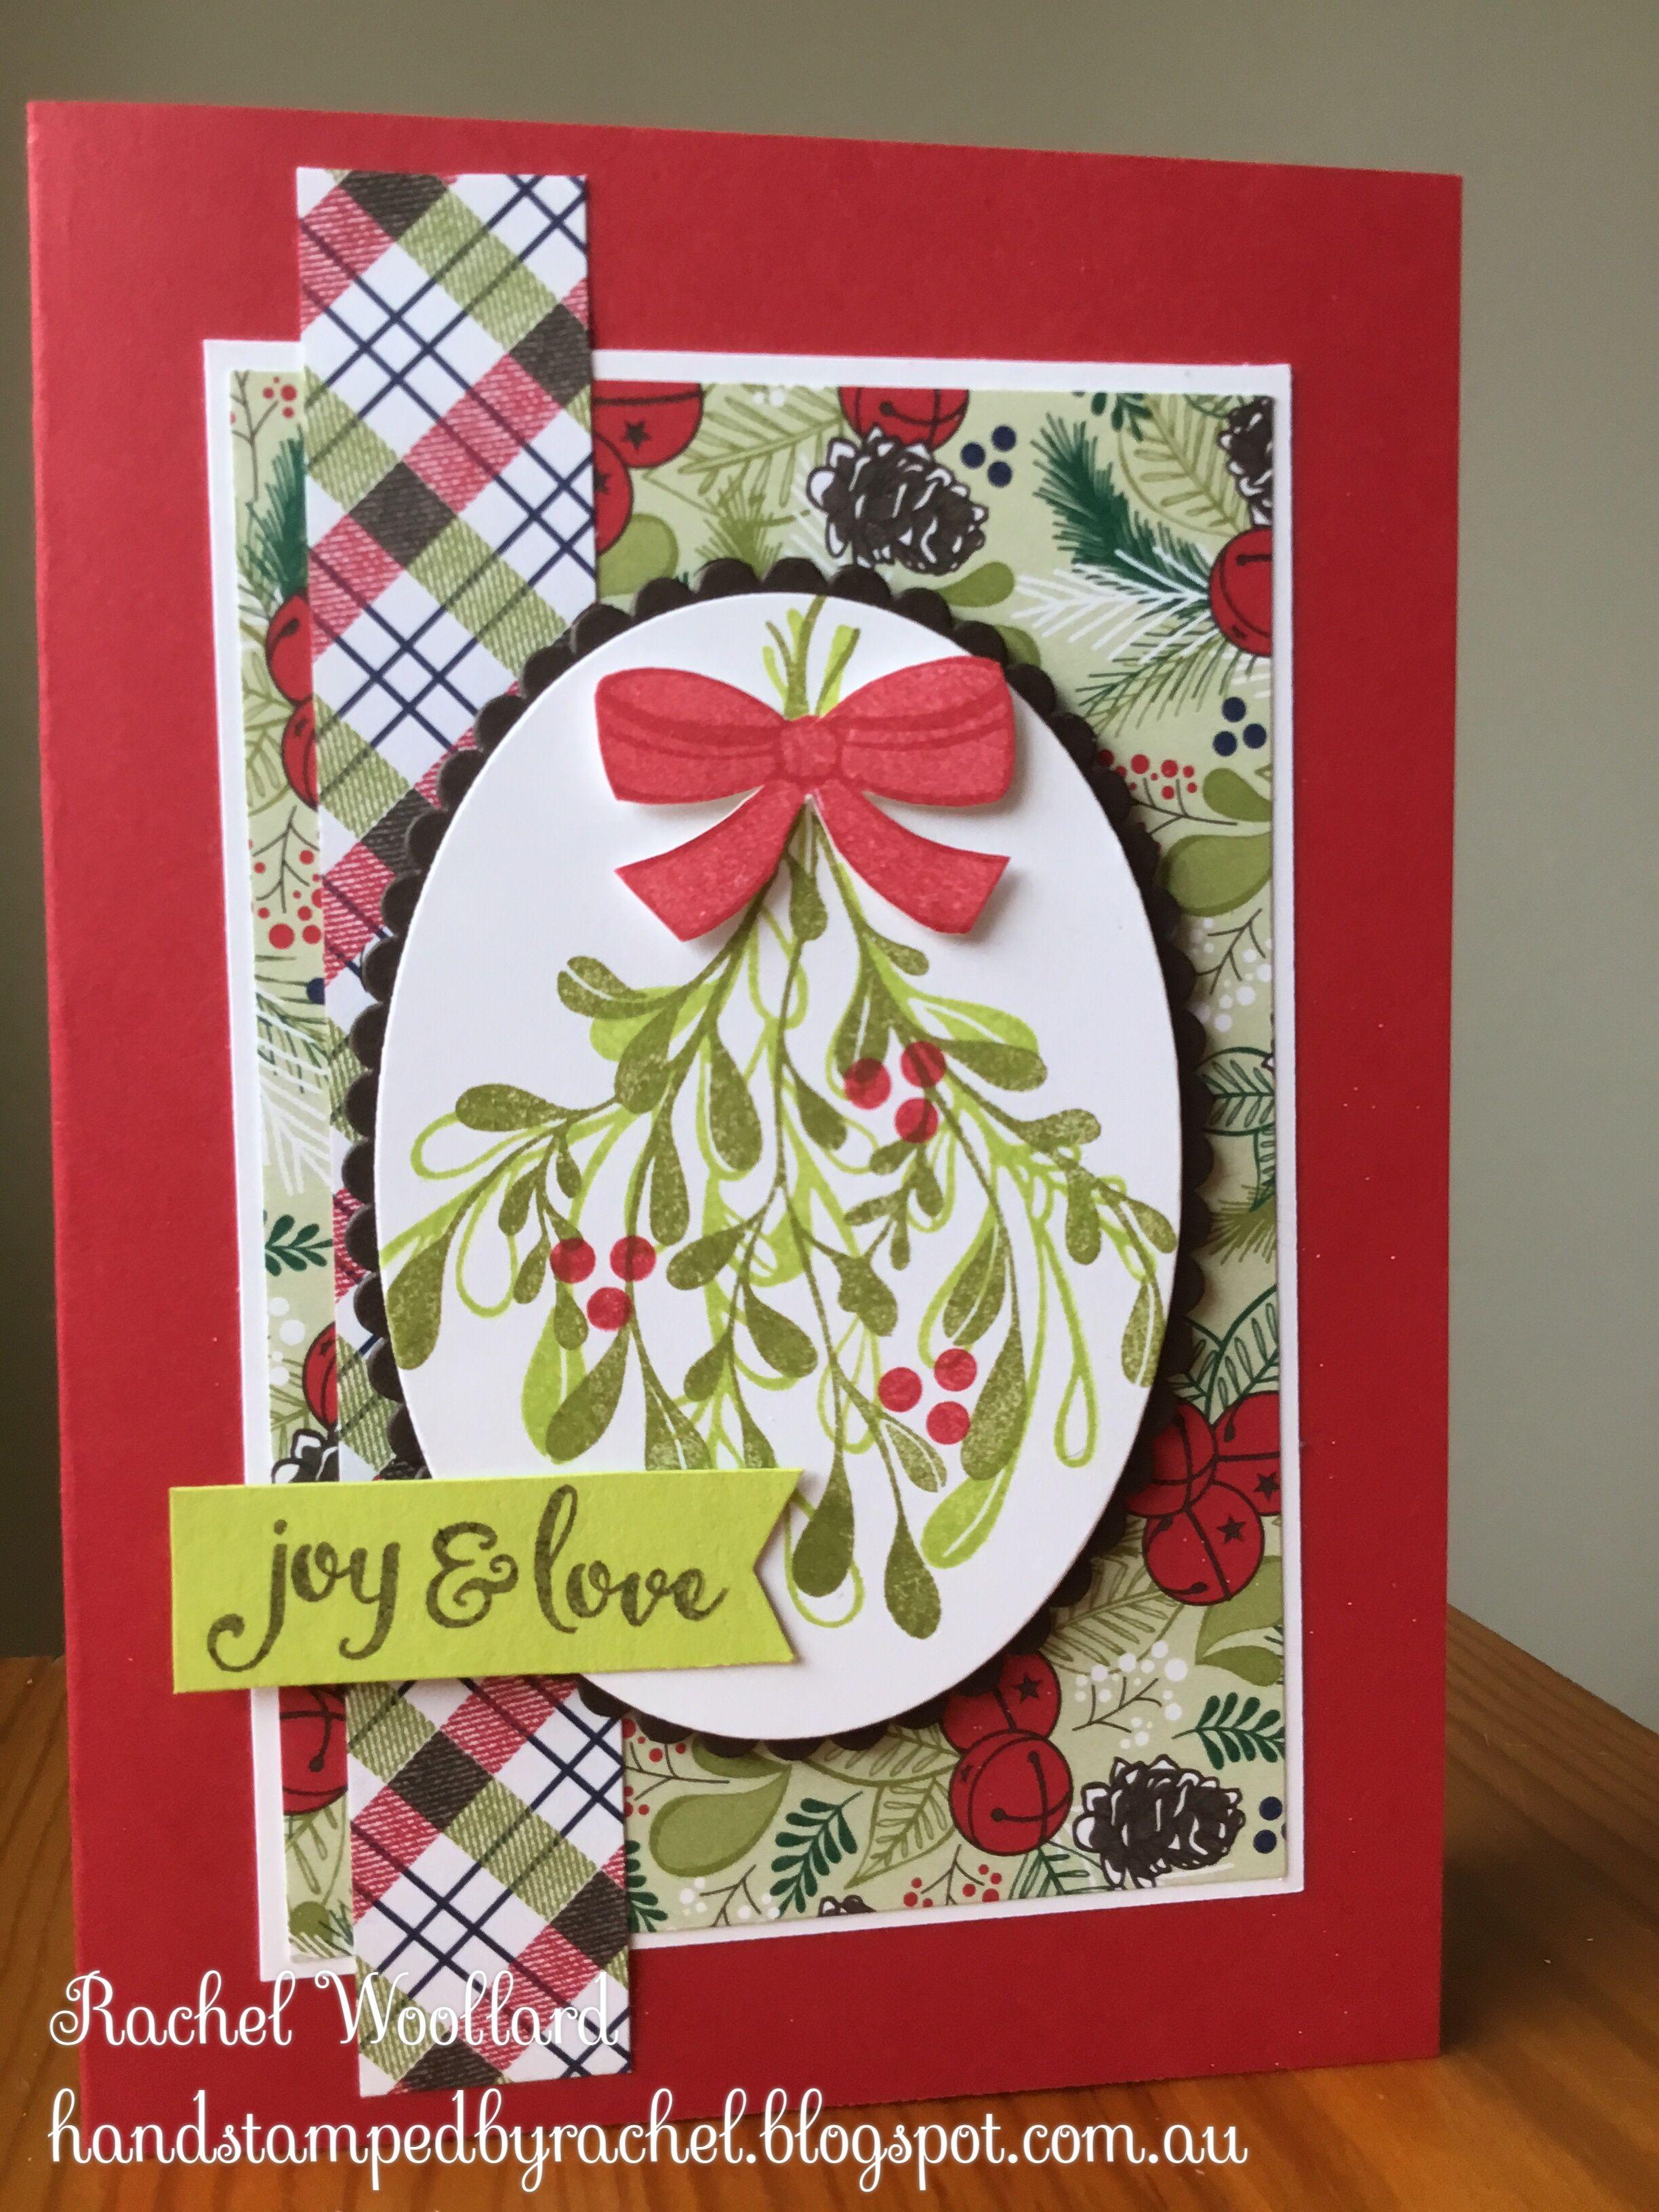 Under the Mistletoe DSP | Christmas Card Ideas for 2018 | Pinterest ...